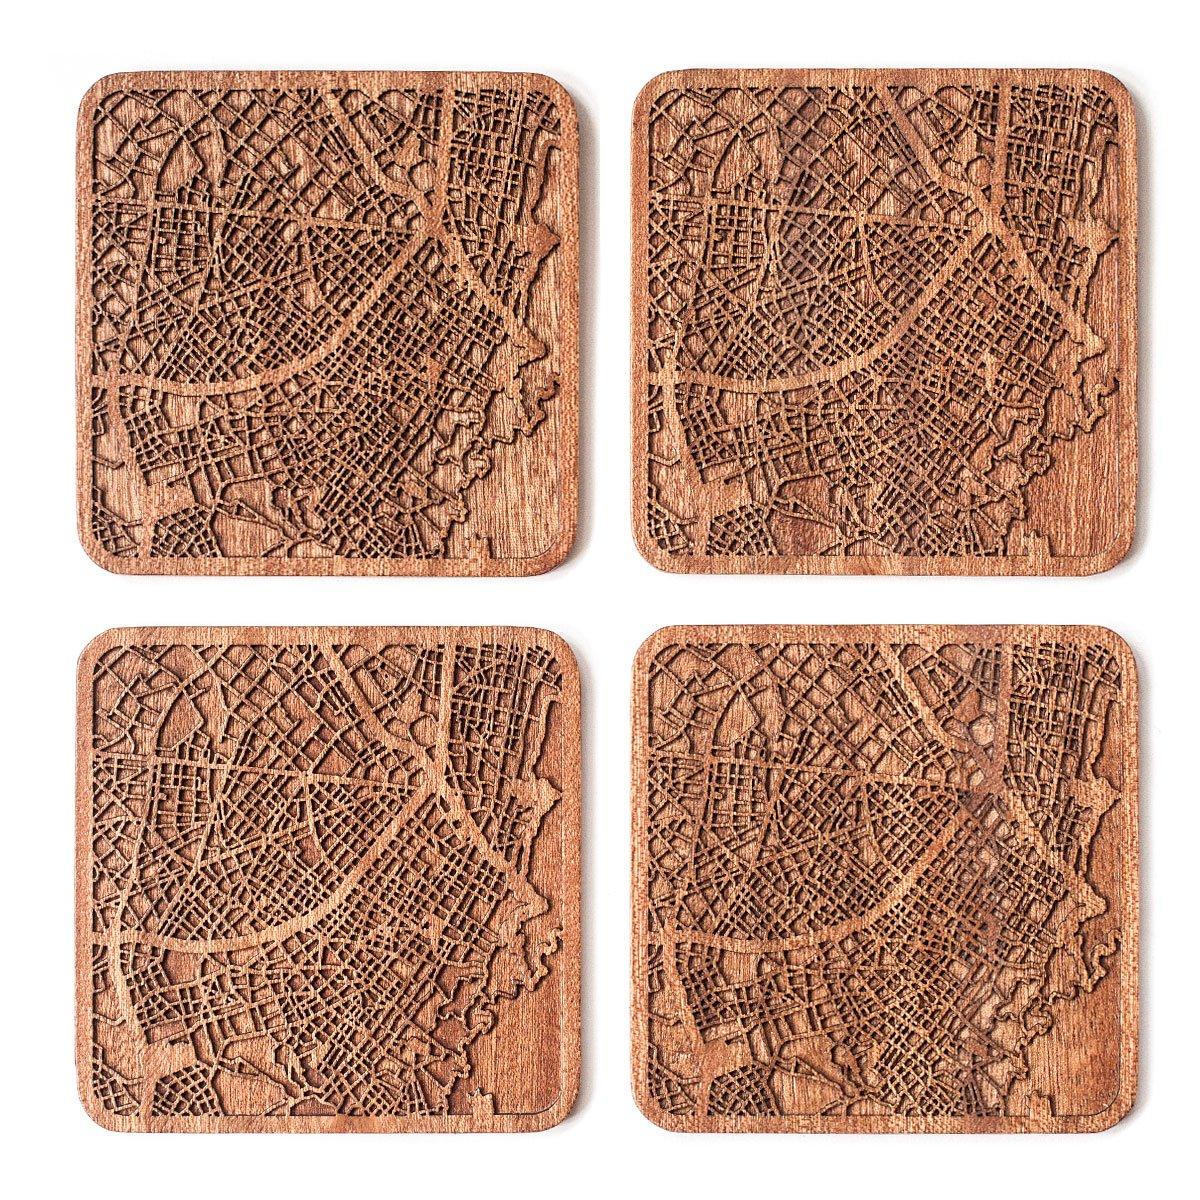 Bogota Map Coaster, Set of 4, Sapele Wooden Coaster